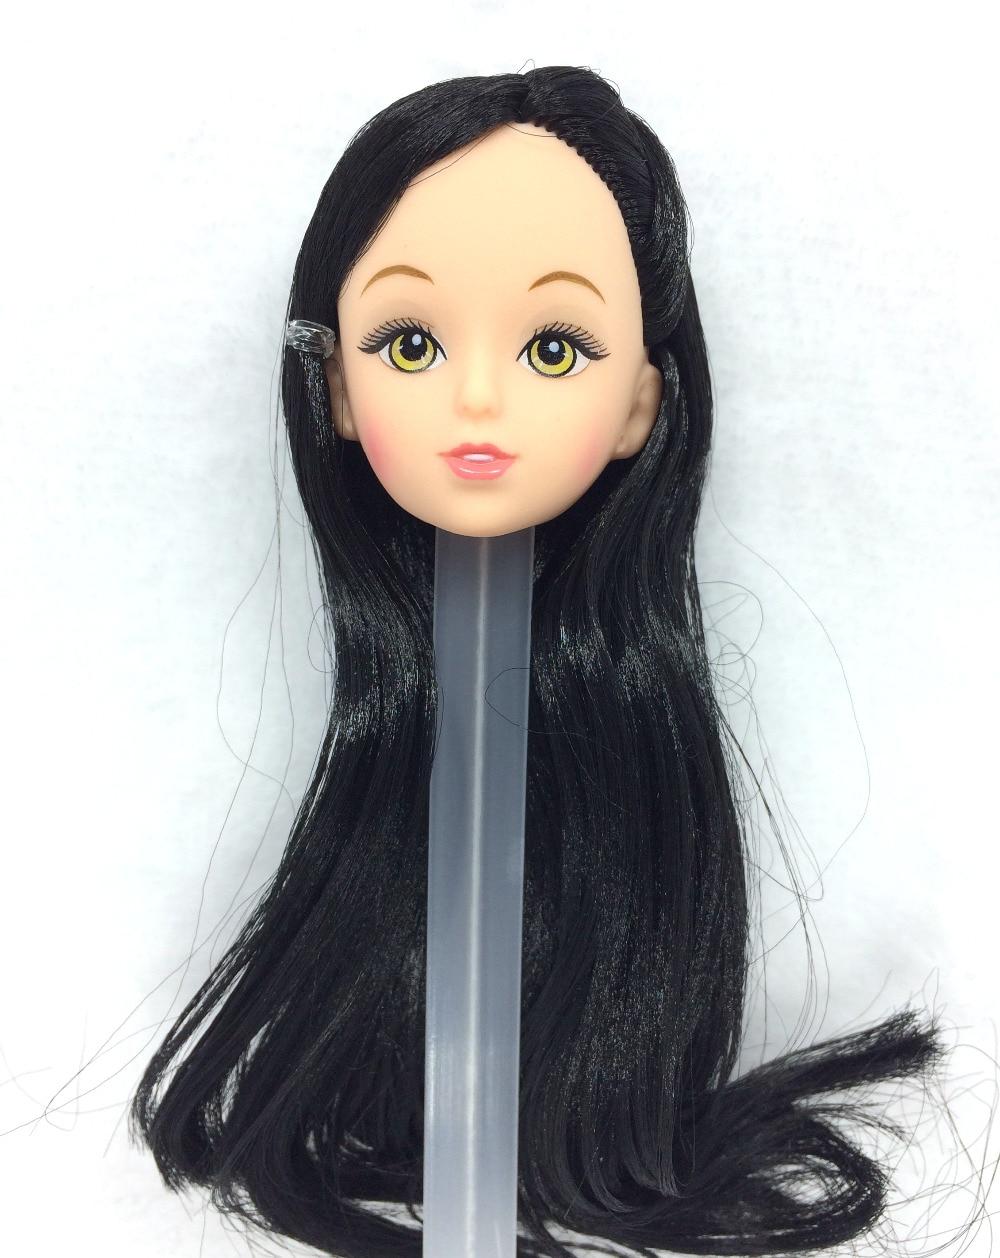 NK One Pcs אופנה בובה ראש שחור שיער עשה זאת - בובות ואביזרים